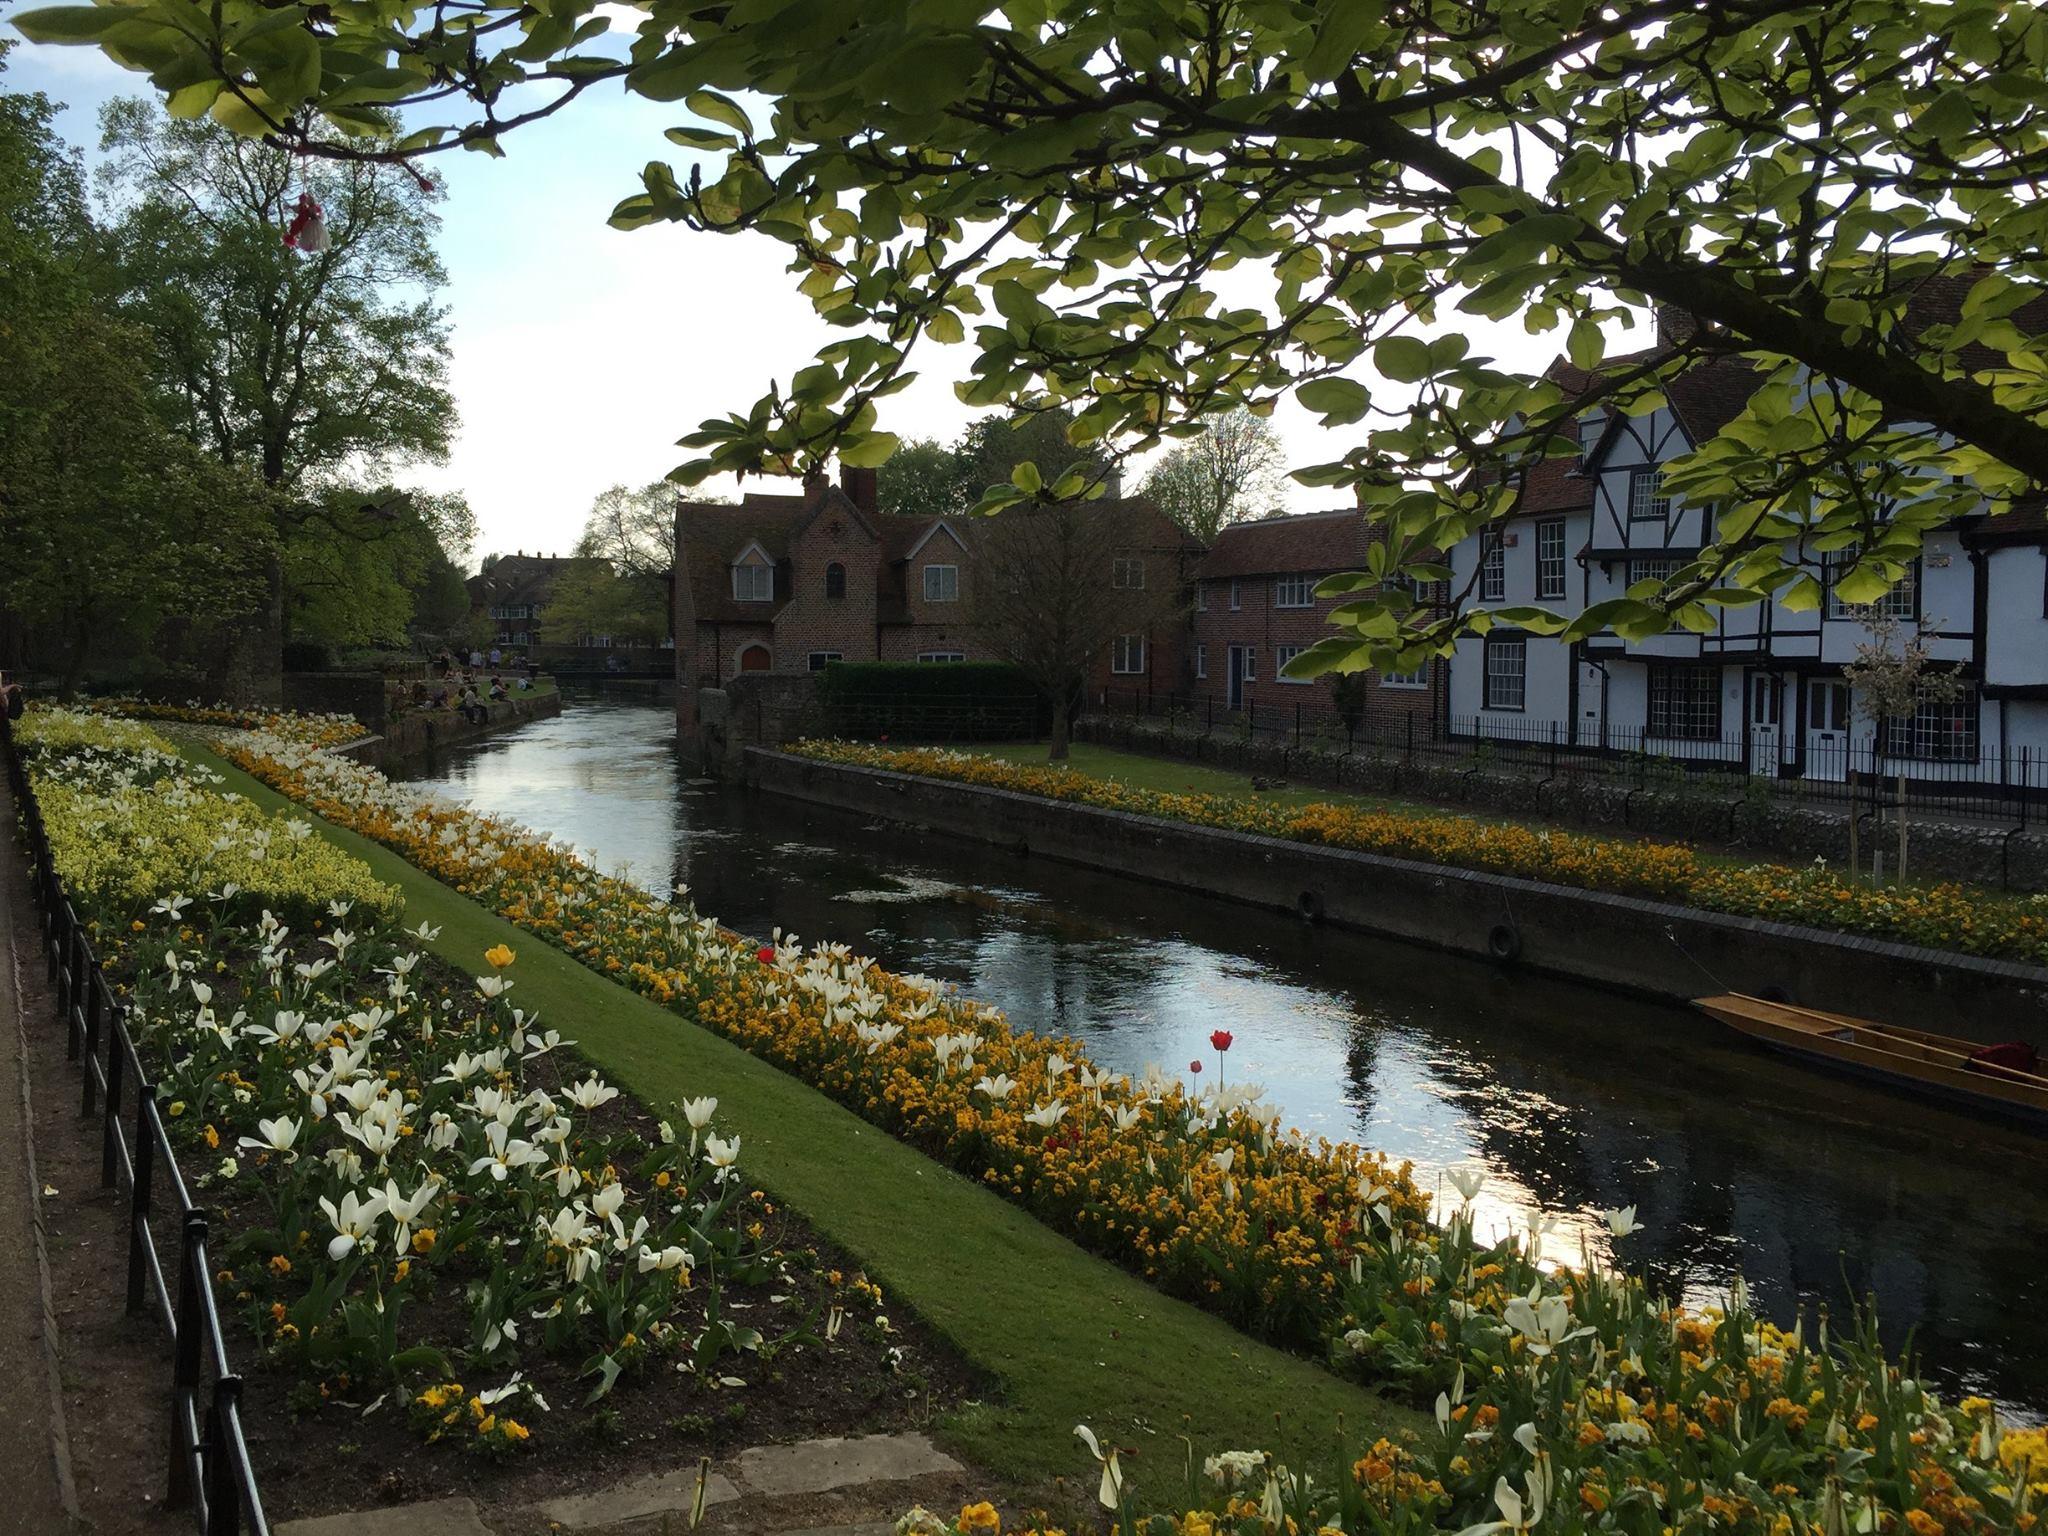 【2016英國行記】8th MAY, Canterbury 坎特伯里之一